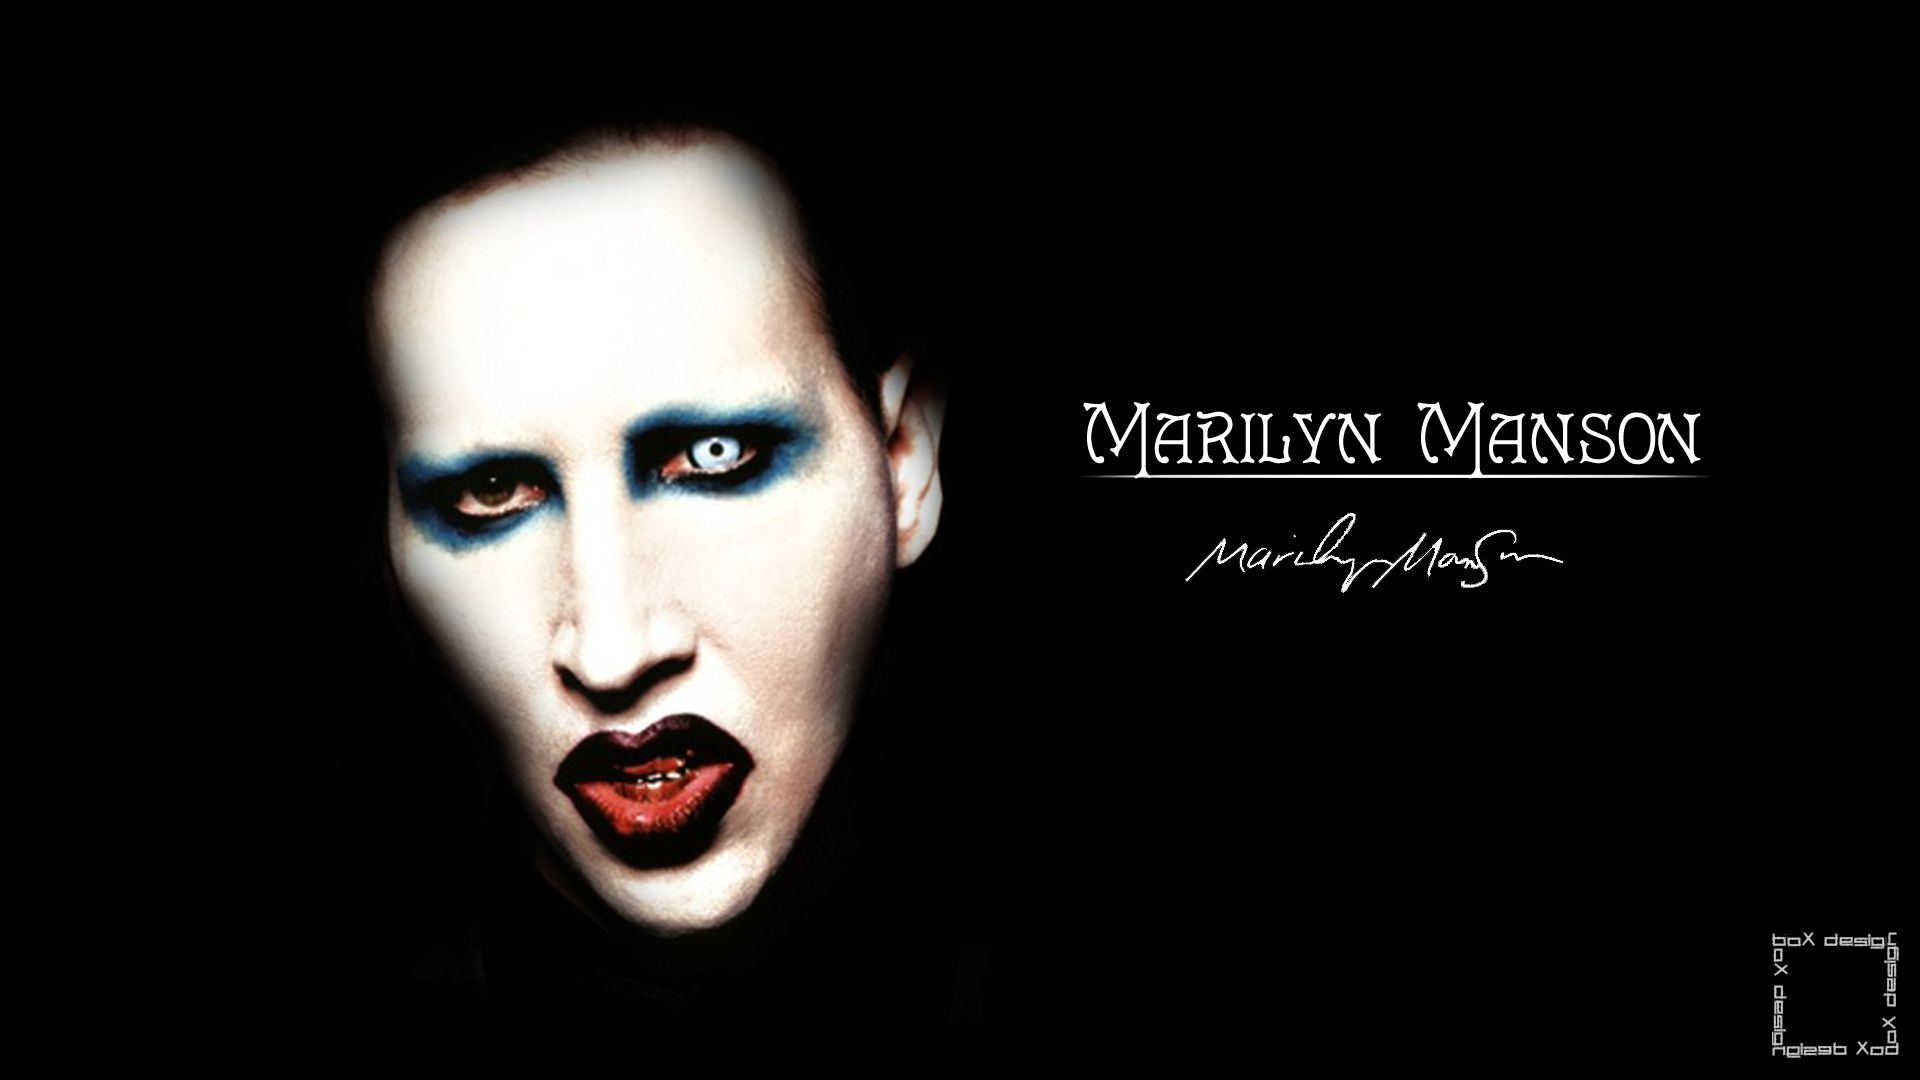 Marilyn Manson Wallpapers Hd Wallpapers Inn Marilyn Manson Manson